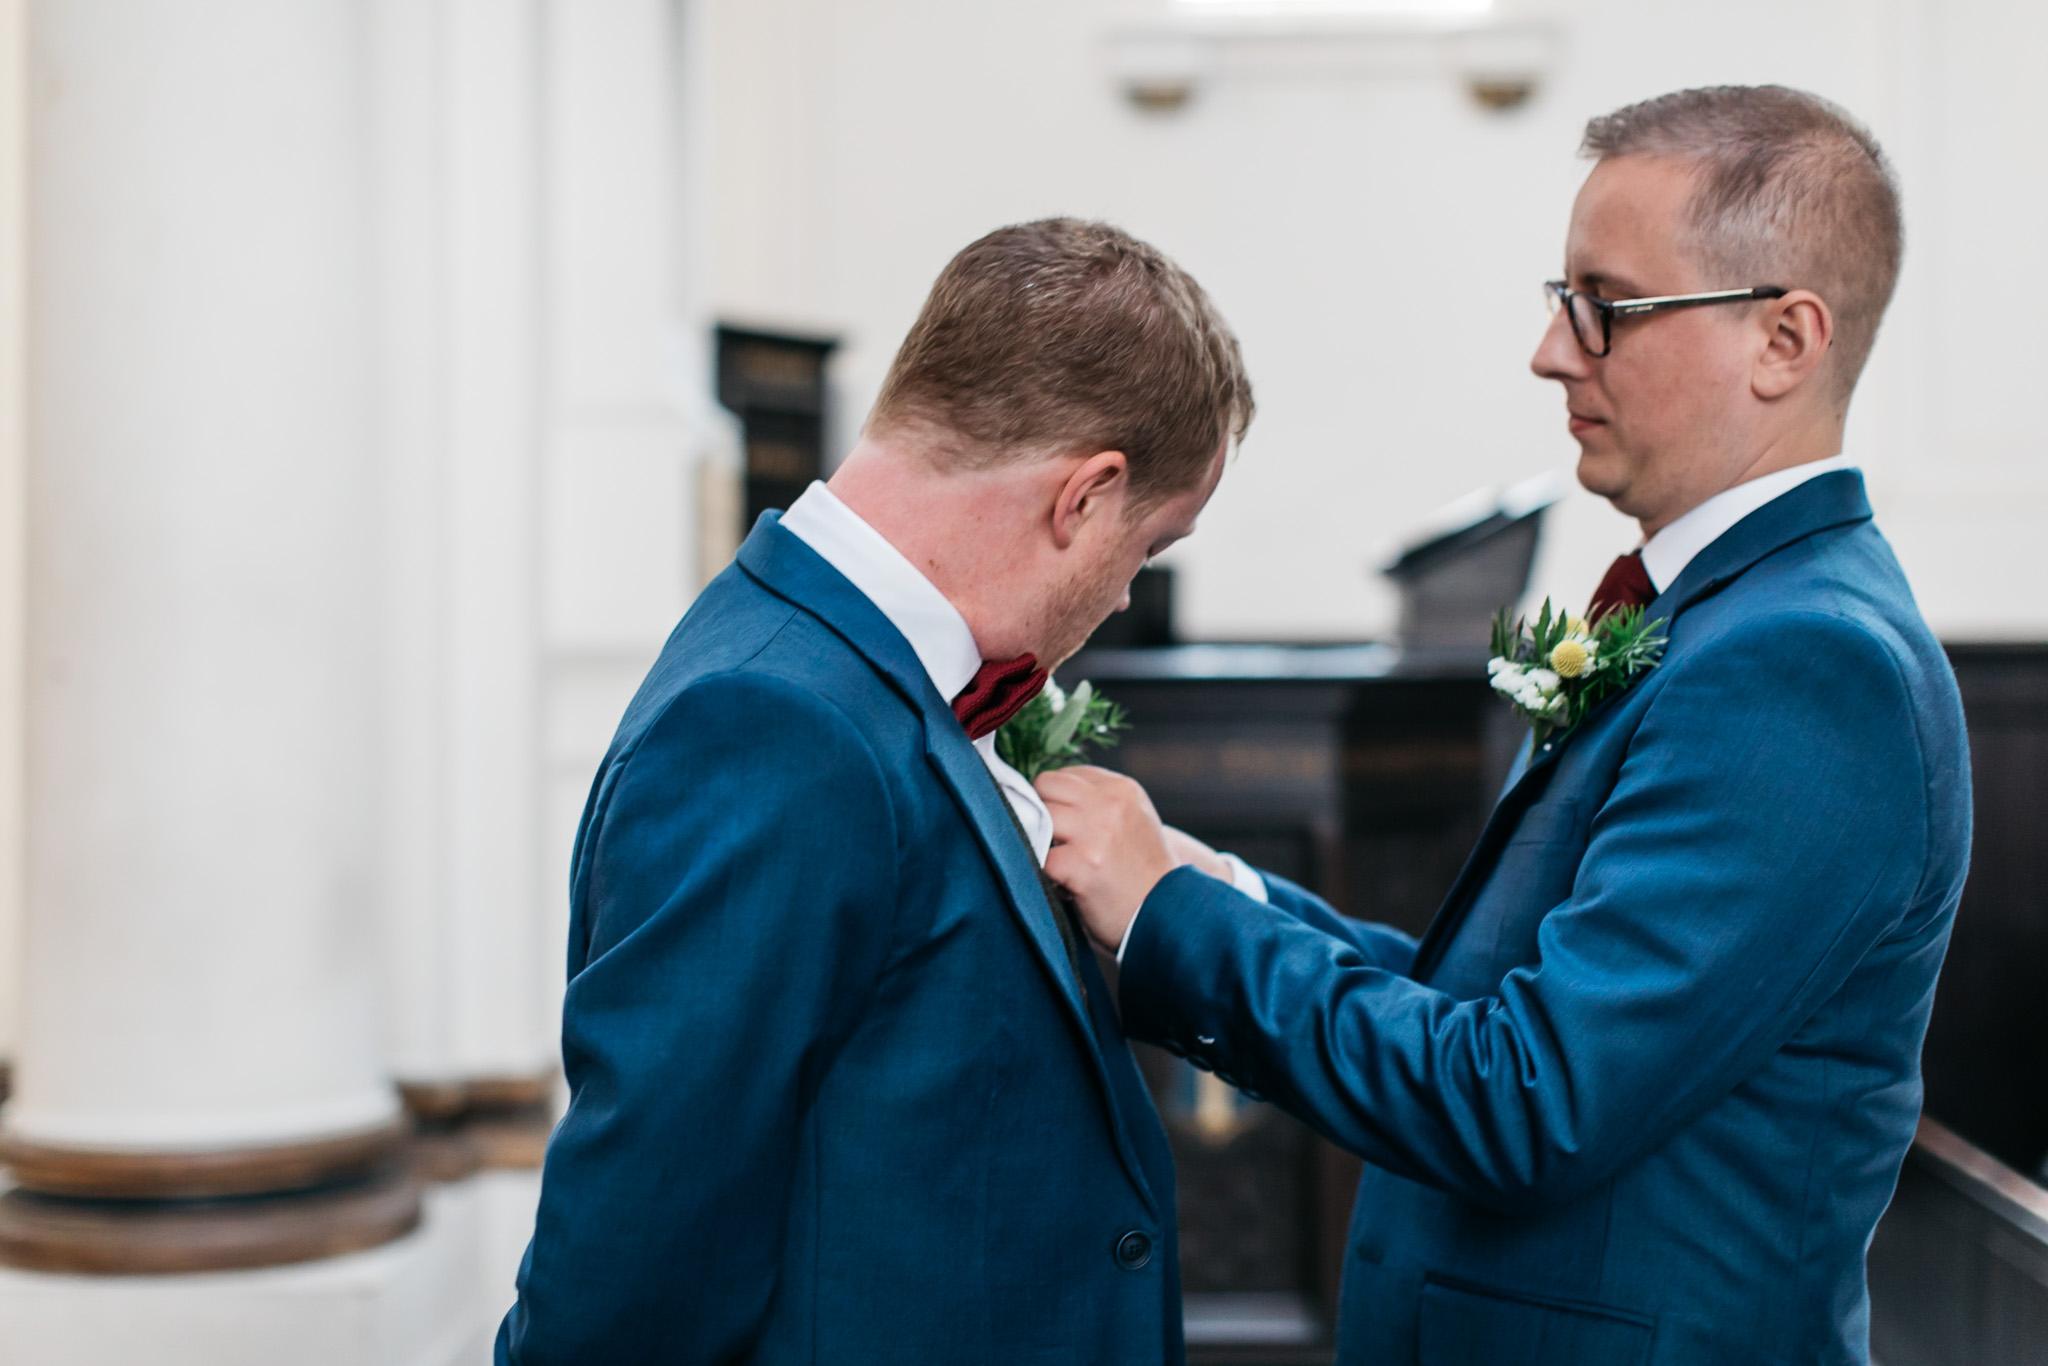 st_andrews_fabrica_brighton_wedding_545.jpg